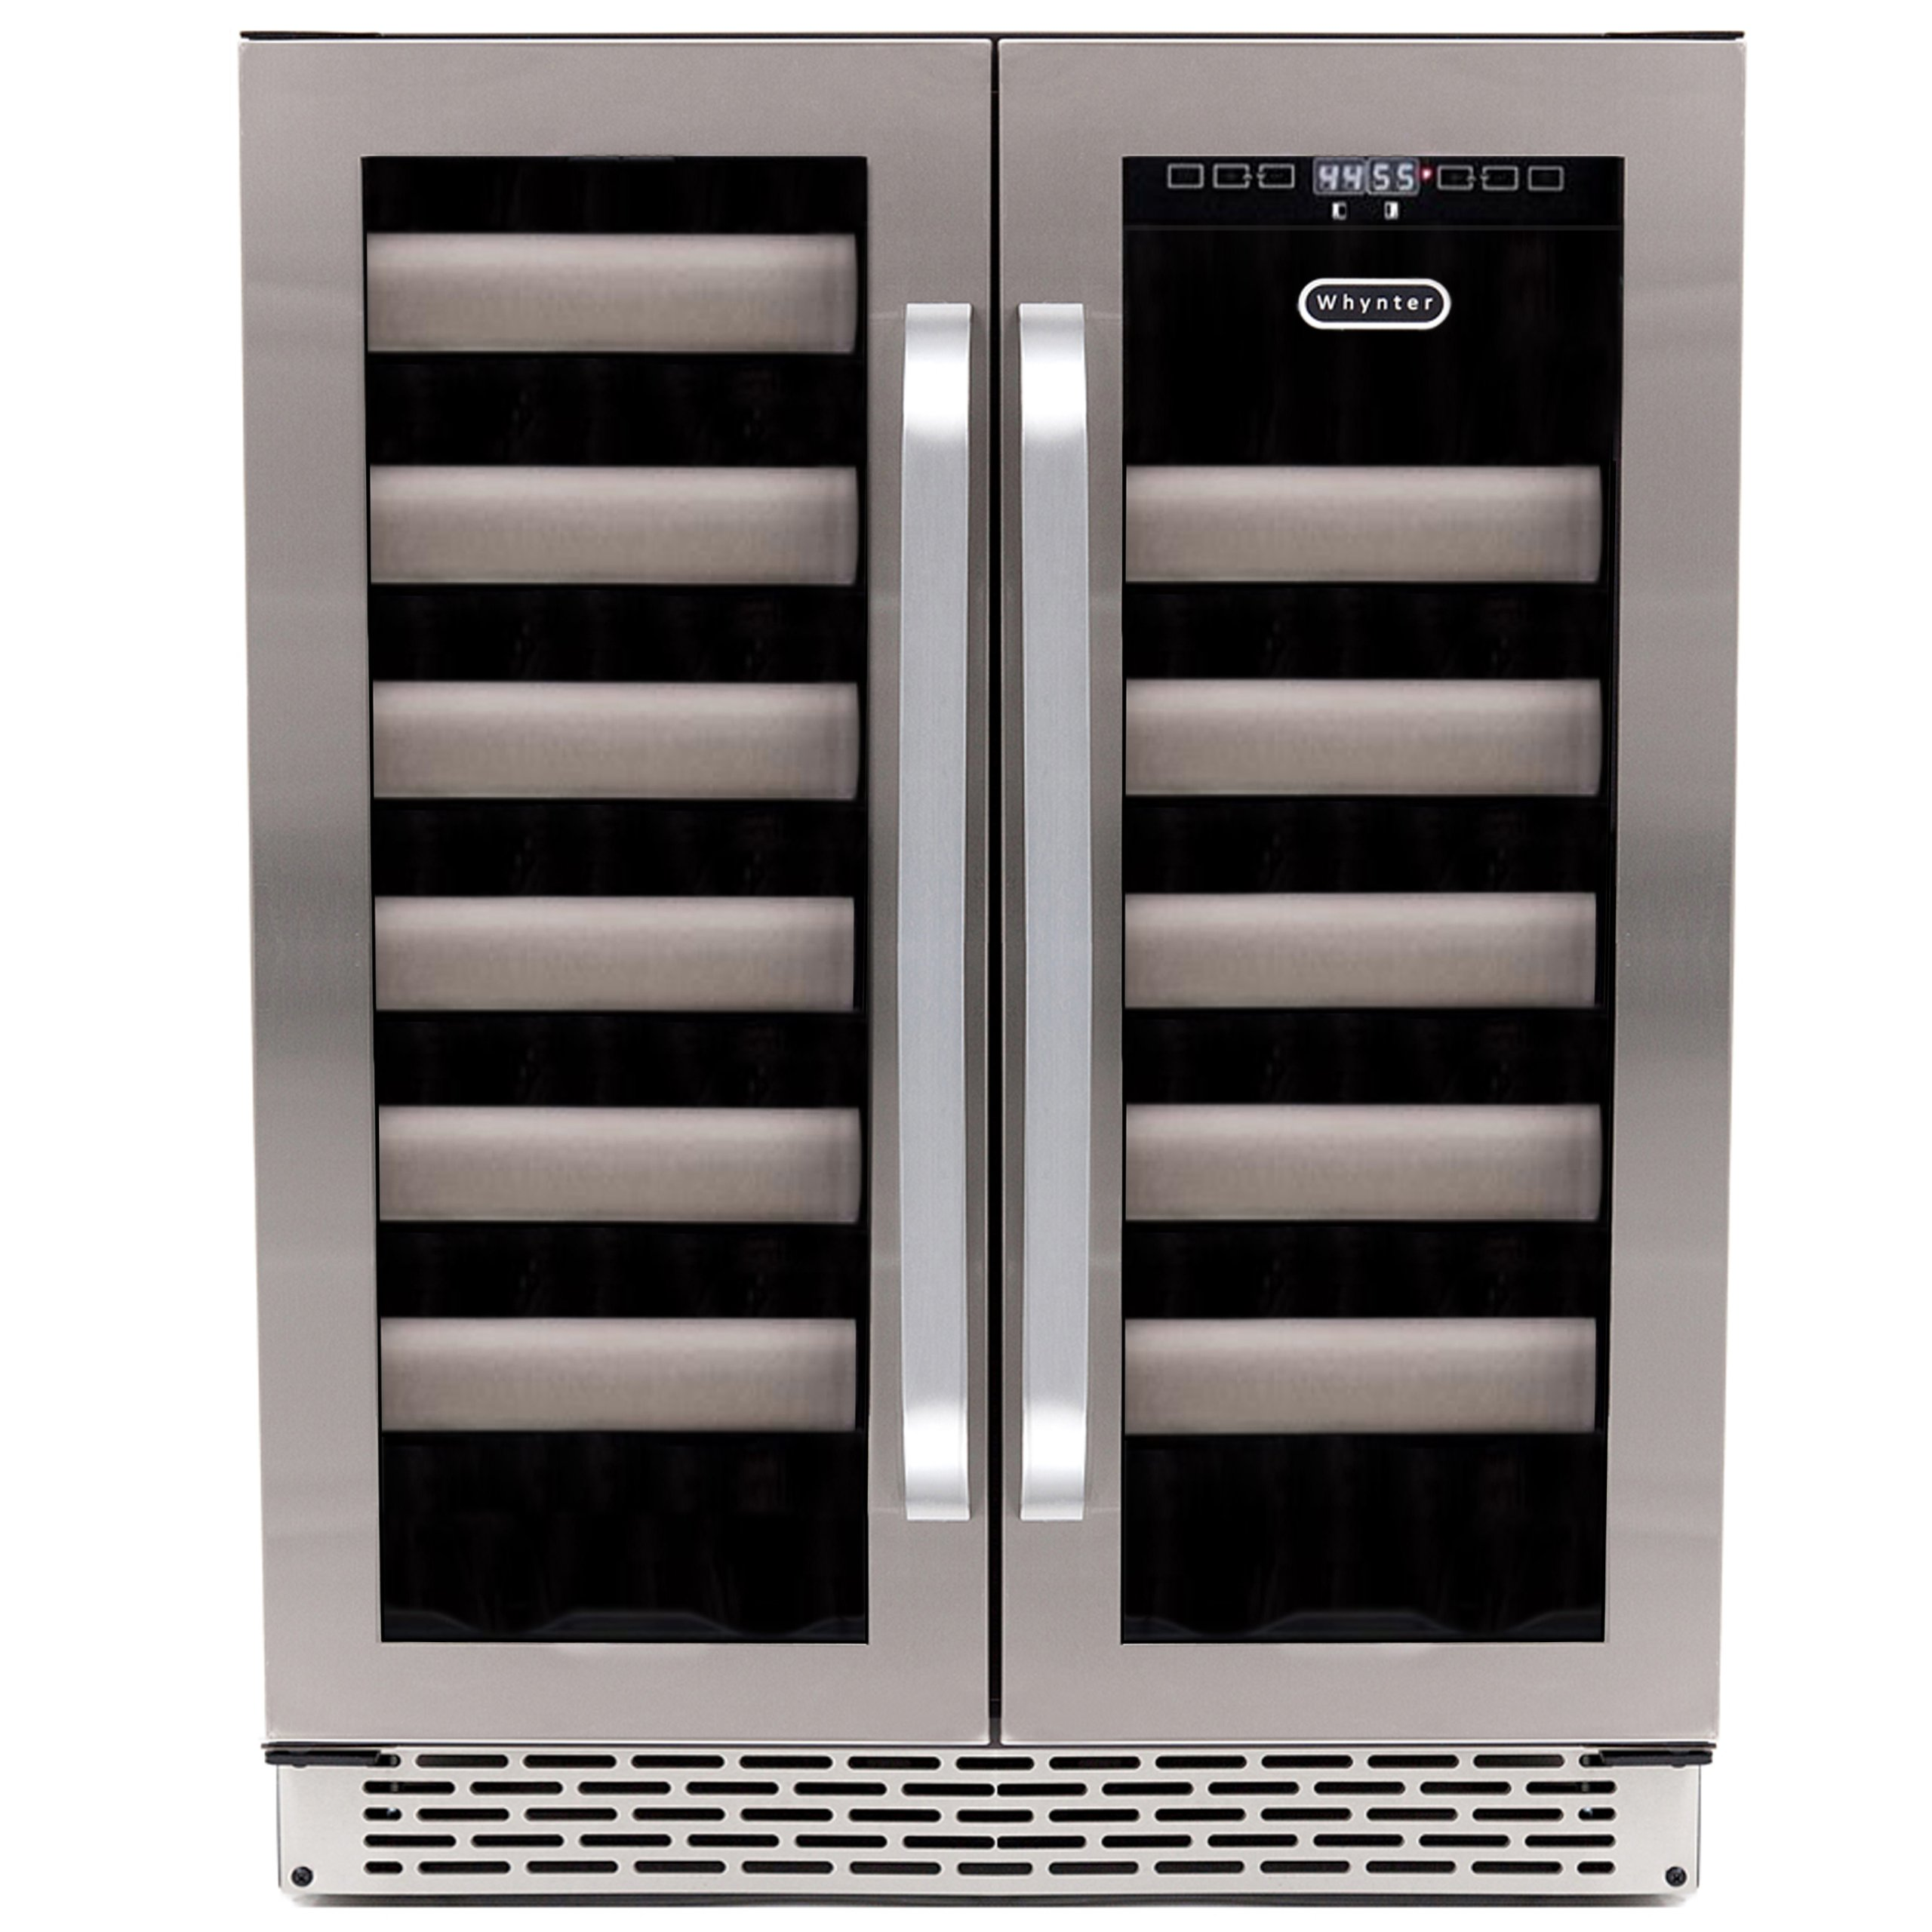 Whynter BWR-401DS Elite 40-Bottle Seamless Stainless Steel Door Dual Zone Built-in Wine Refrigerator